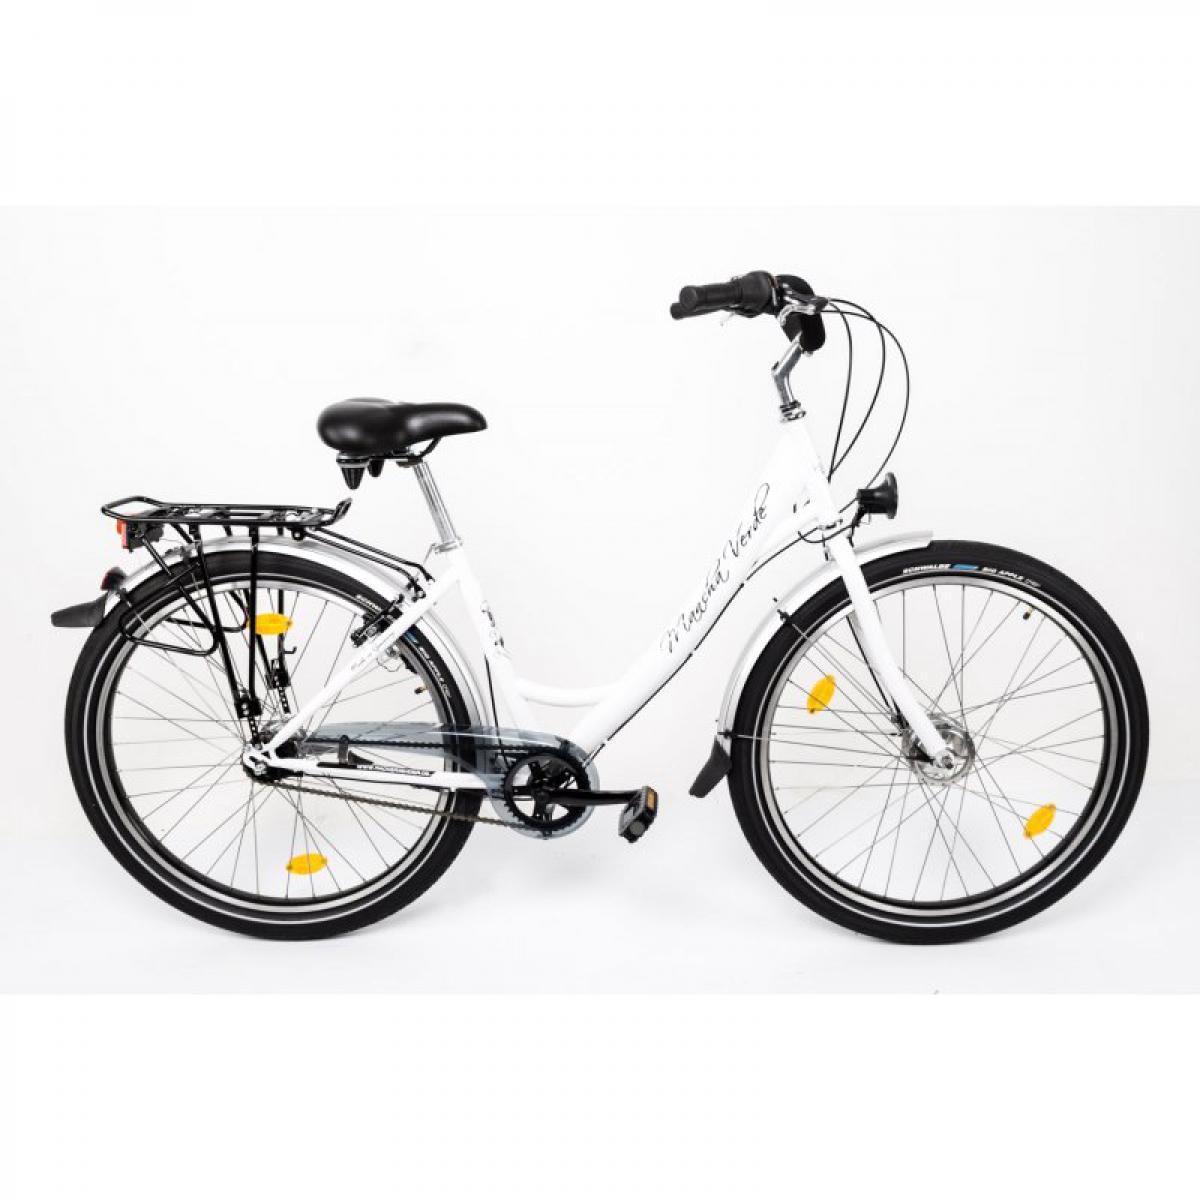 28 zoll damen rad fahrrad city fahrrad rent bike shimano nexus 7 gang xxl weiss ihr fahrrad. Black Bedroom Furniture Sets. Home Design Ideas